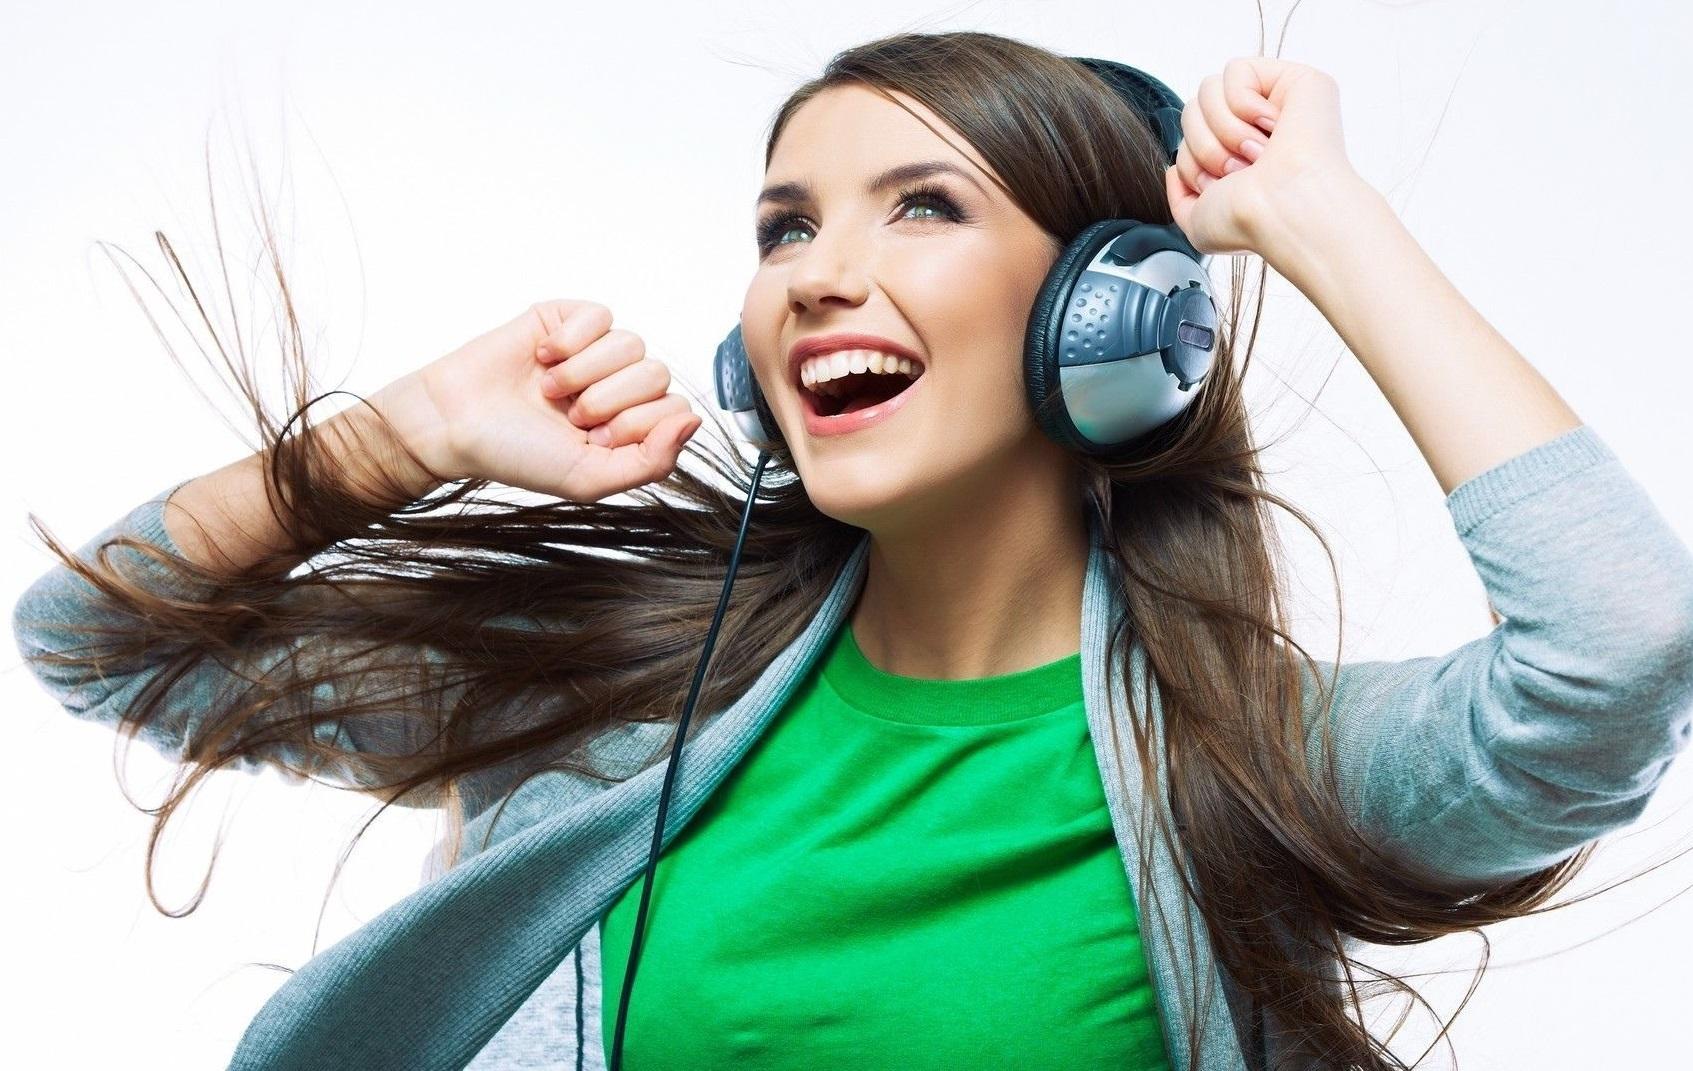 PunjabKesari, music benefits Image